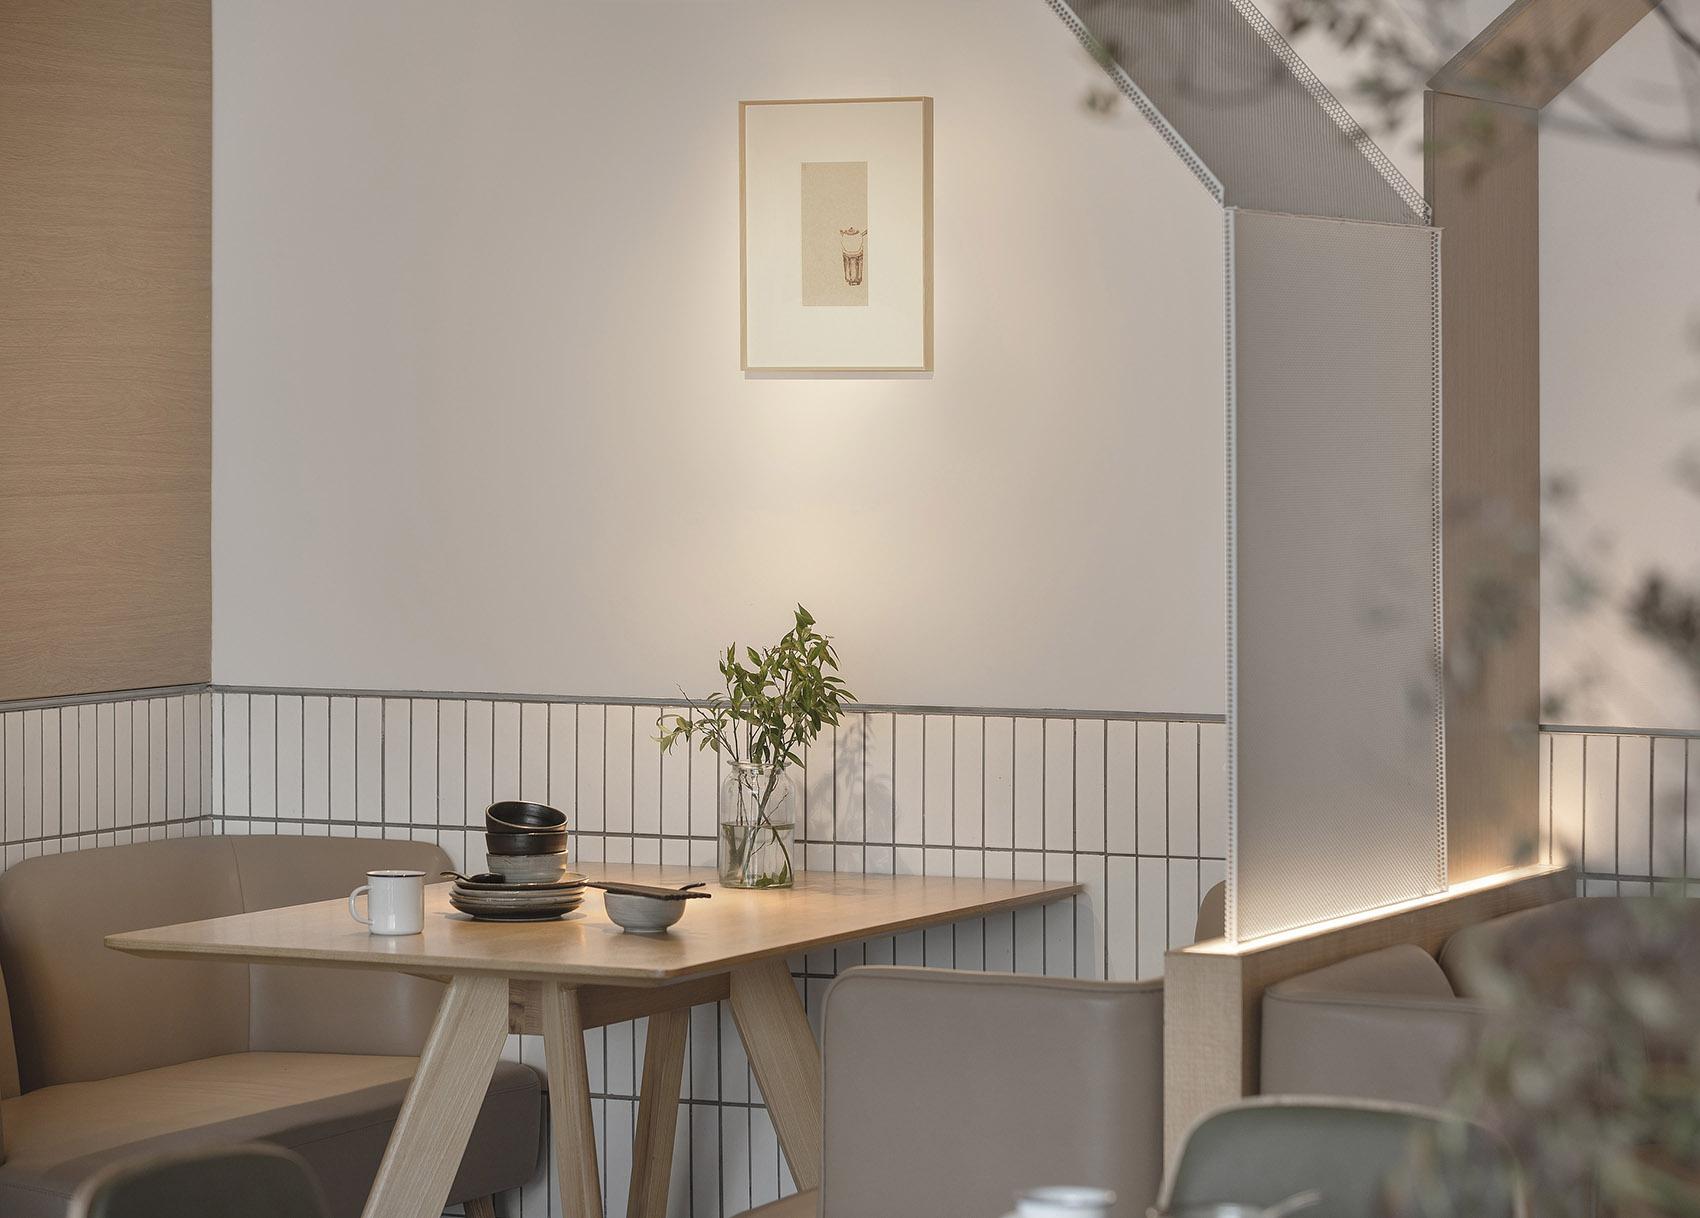 004-goose-hut-home-bistro-china-by-golucci-interior-architects.jpg